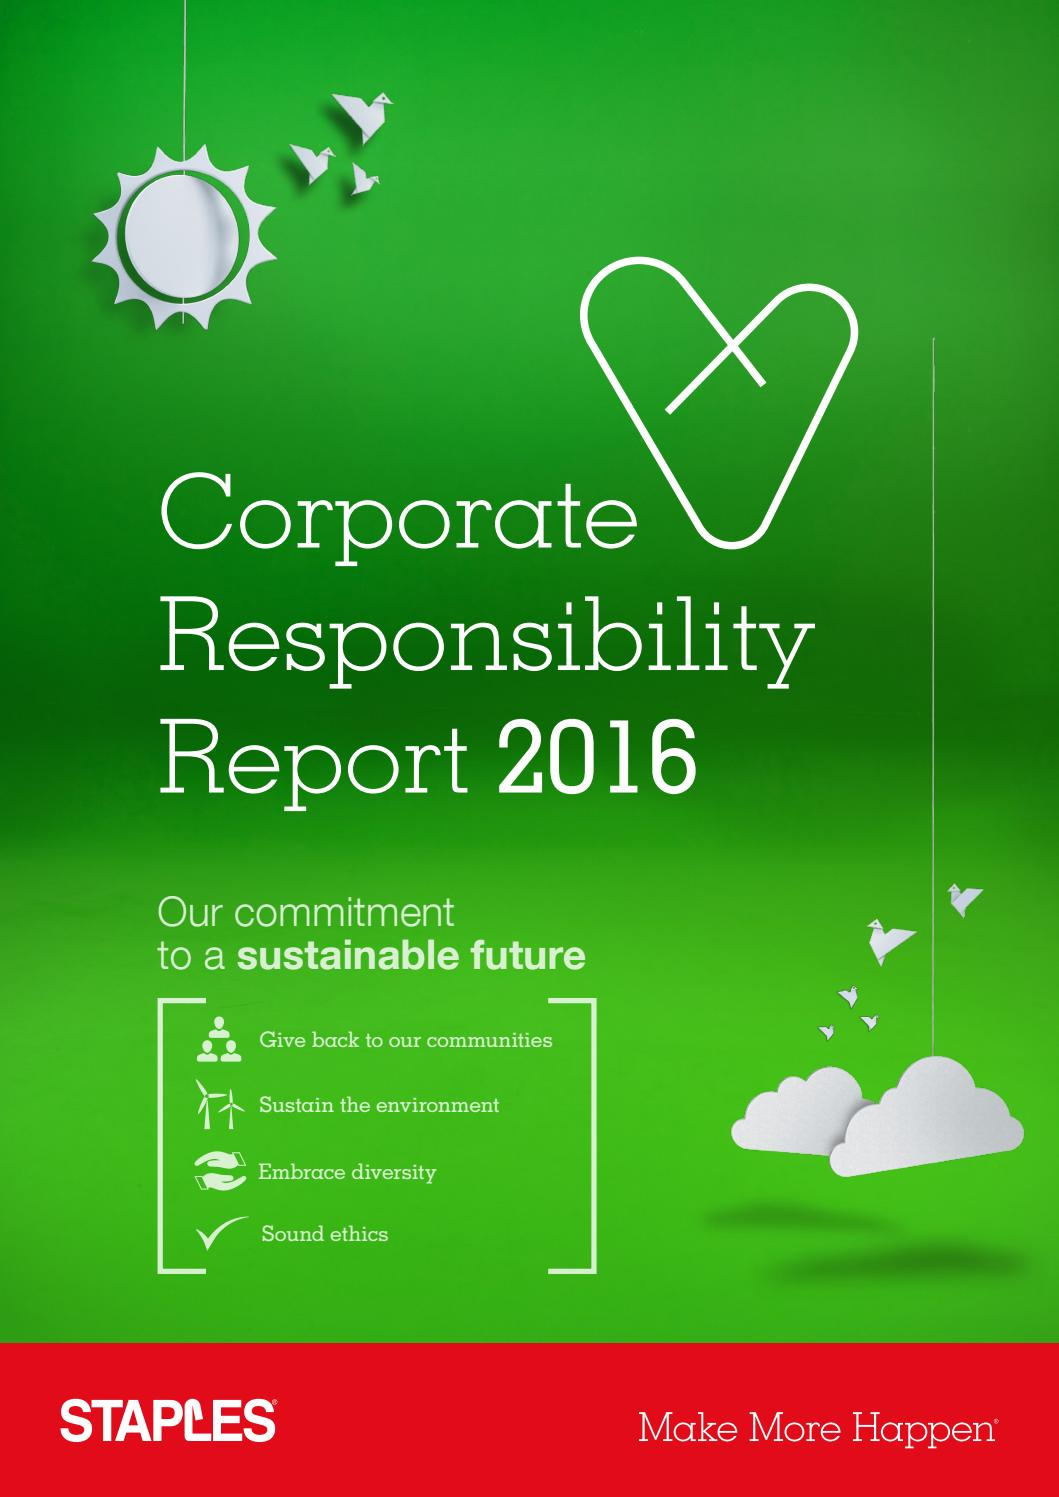 mcdonalds csr report 2016